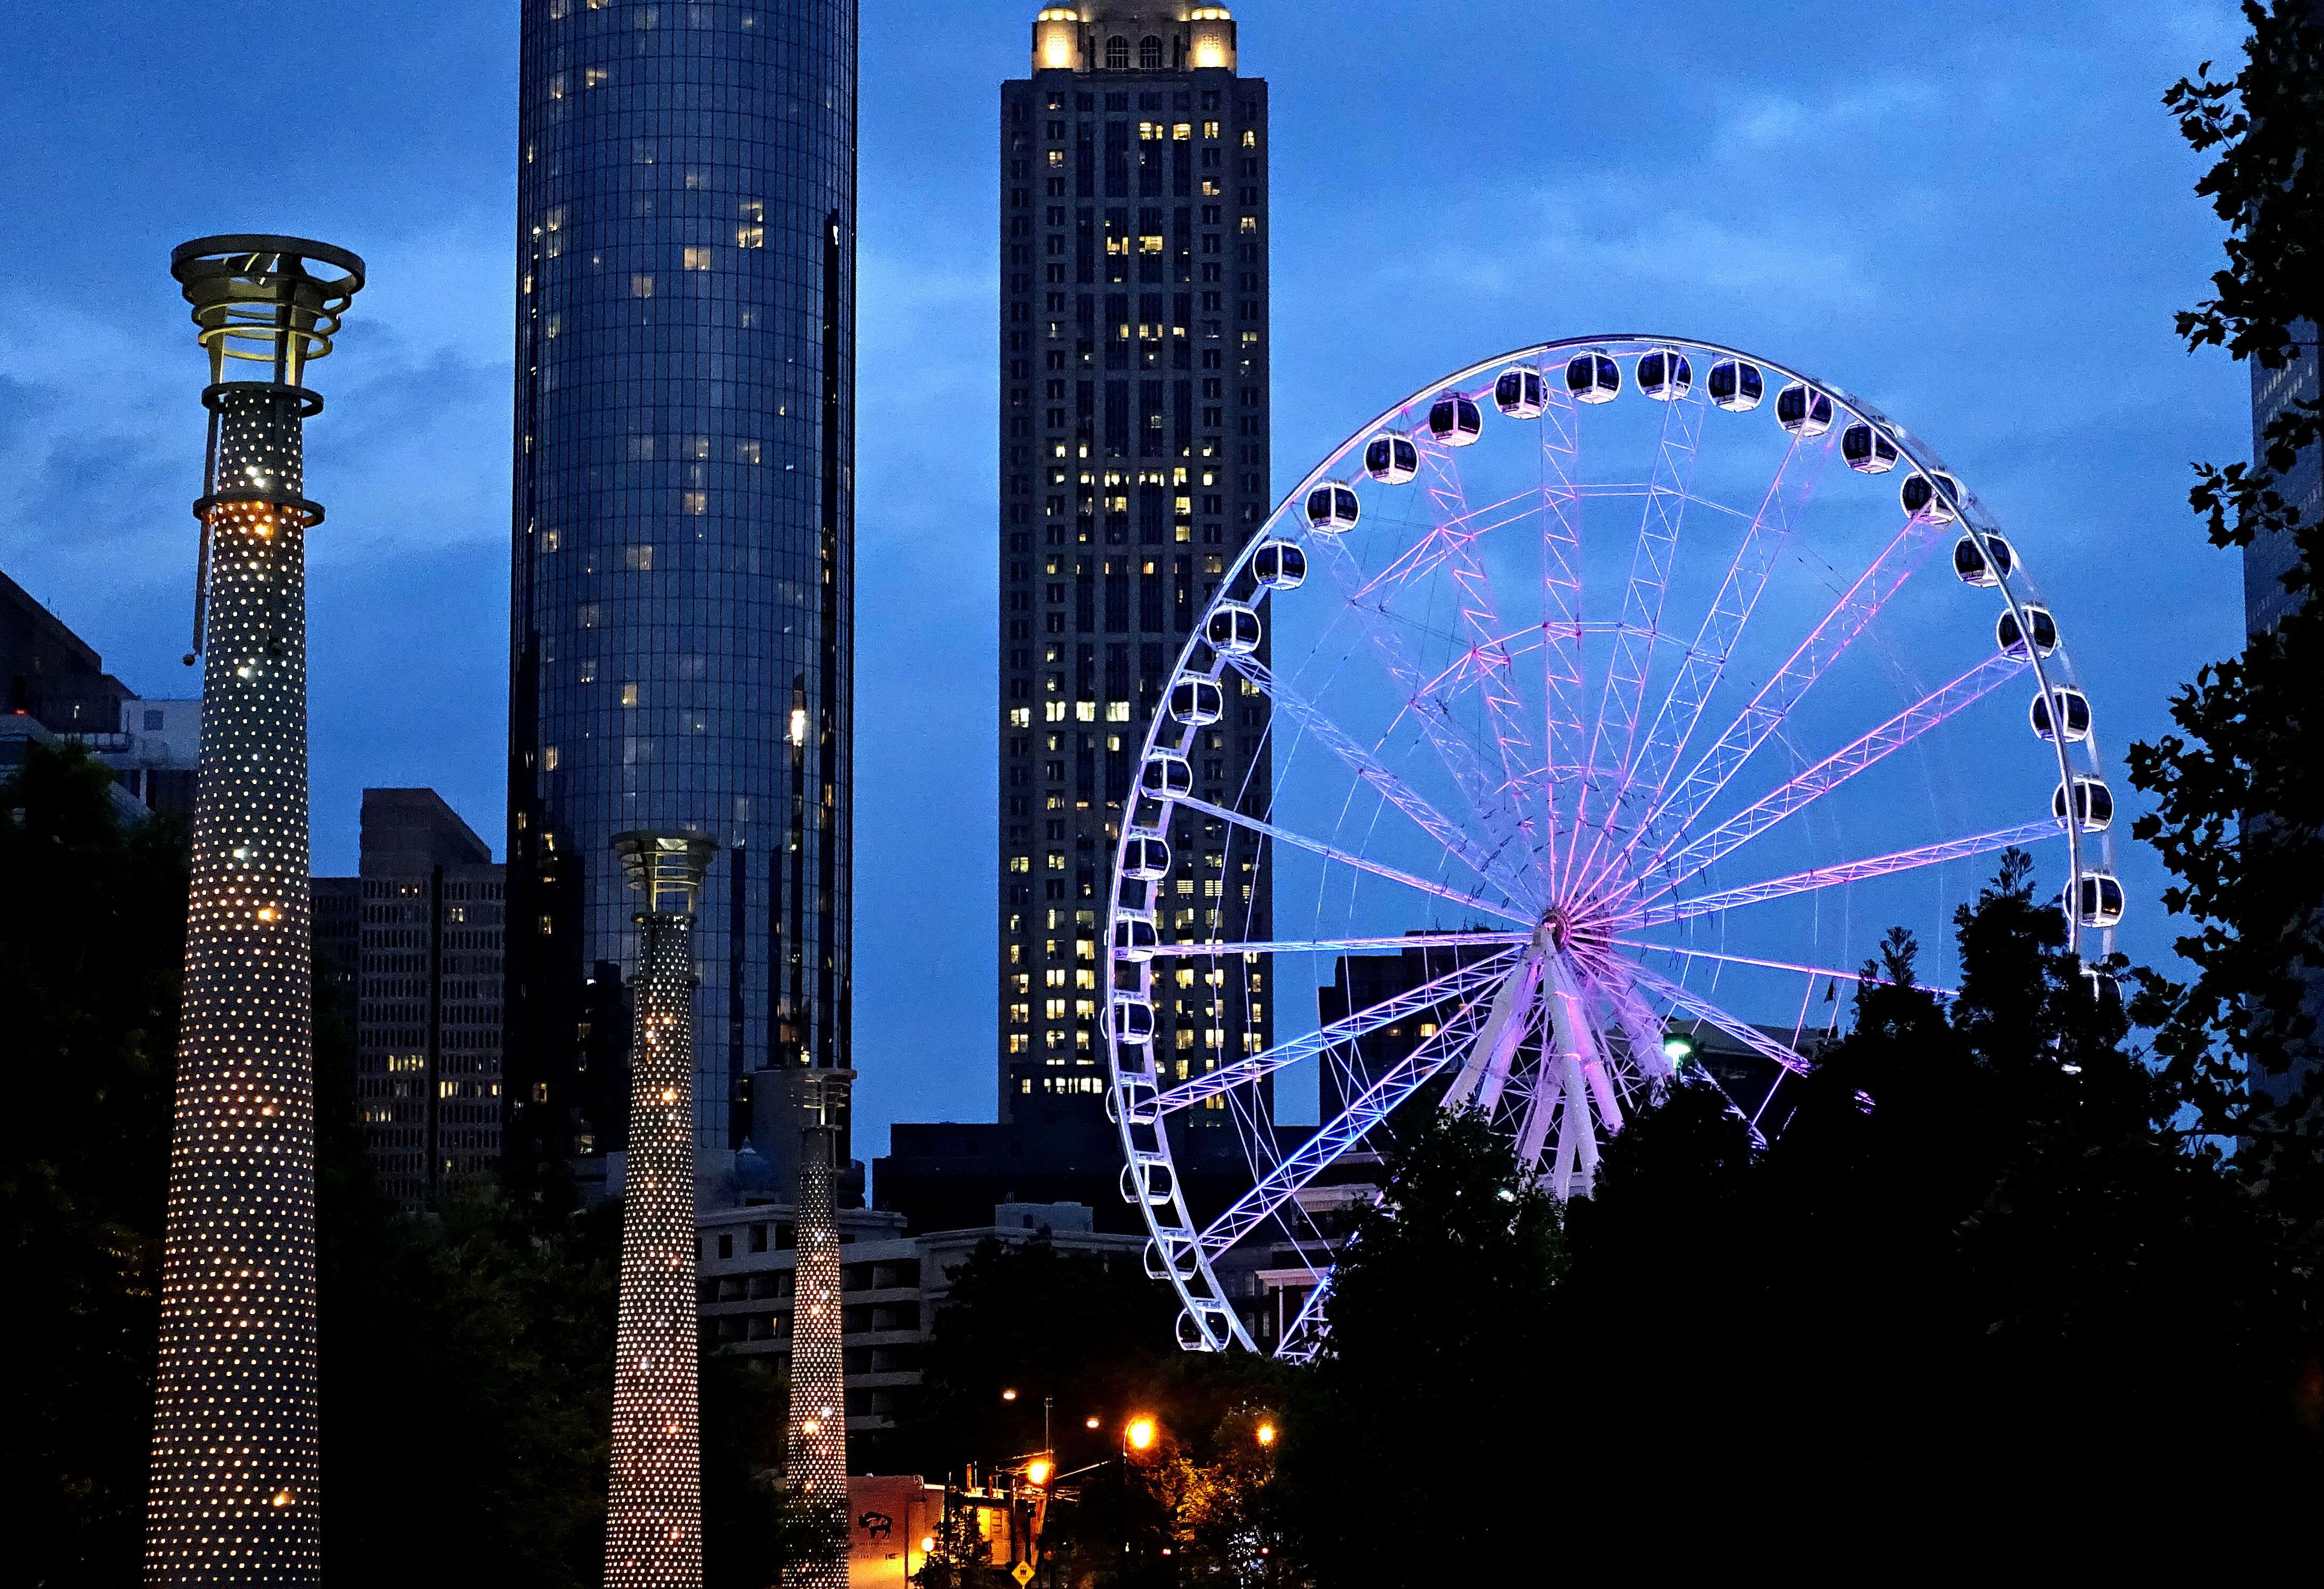 Atlanta Ferris Wheel lit up at night